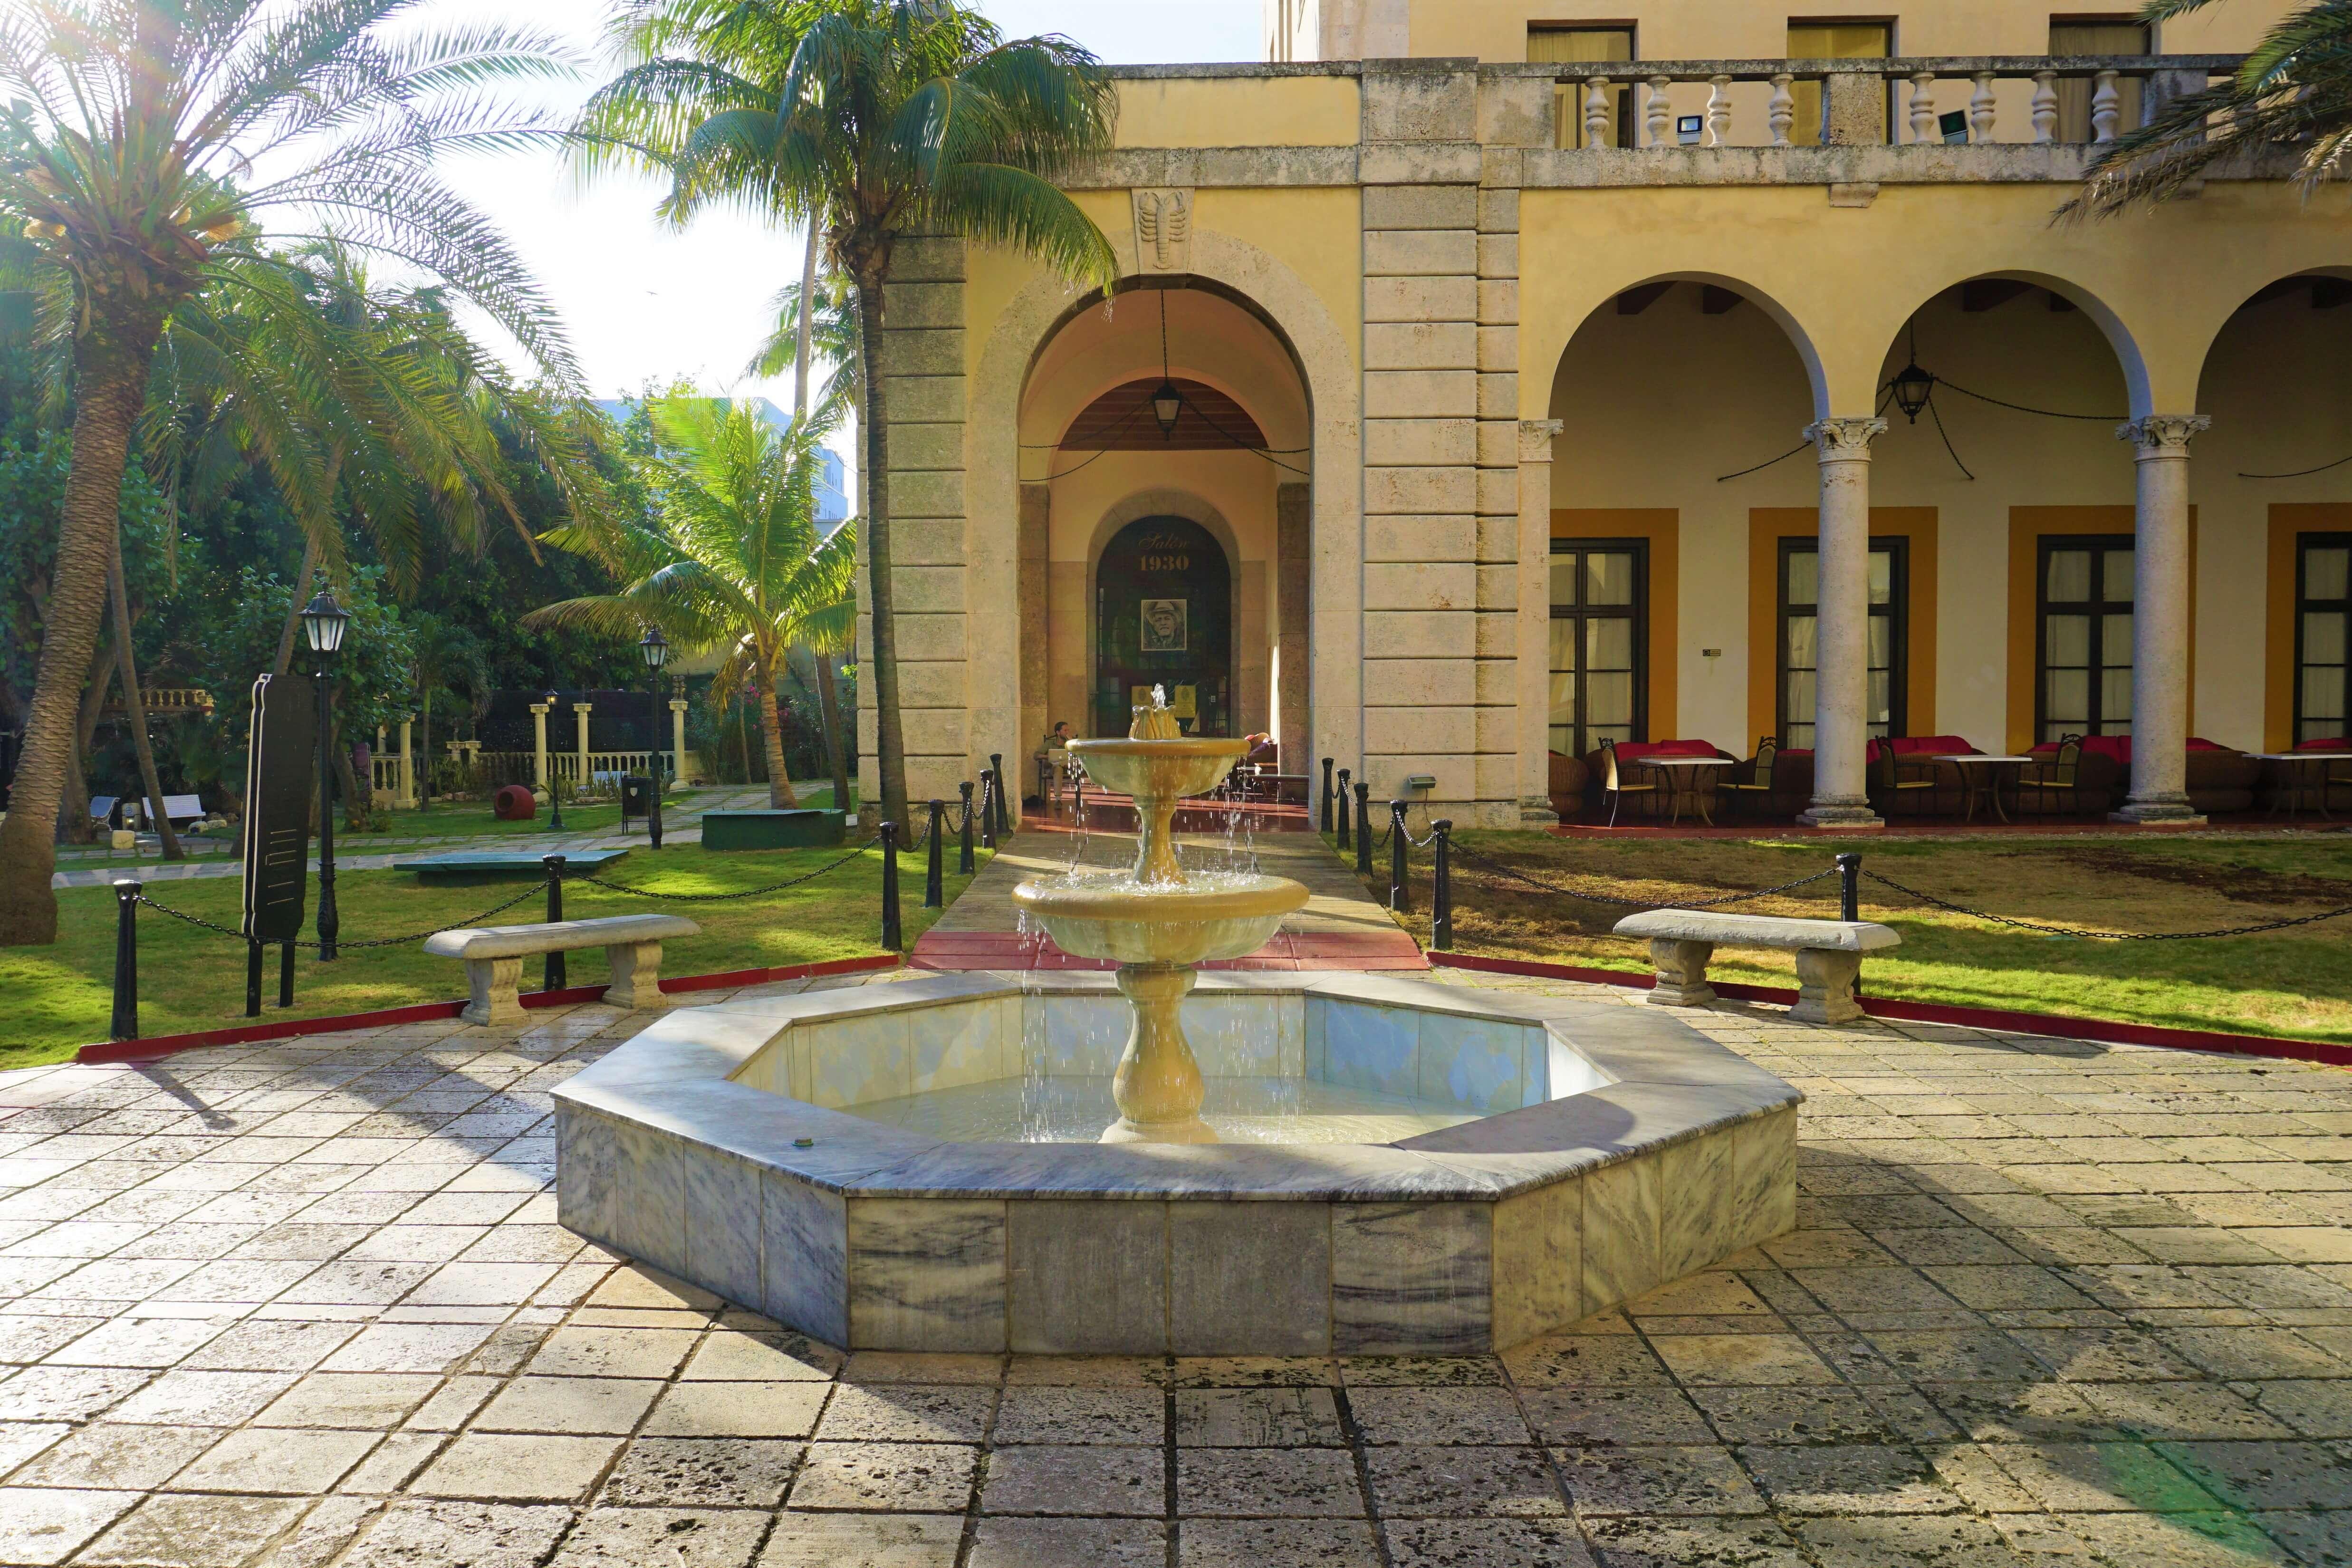 Courtyard of Hotel Nacional de Cuba